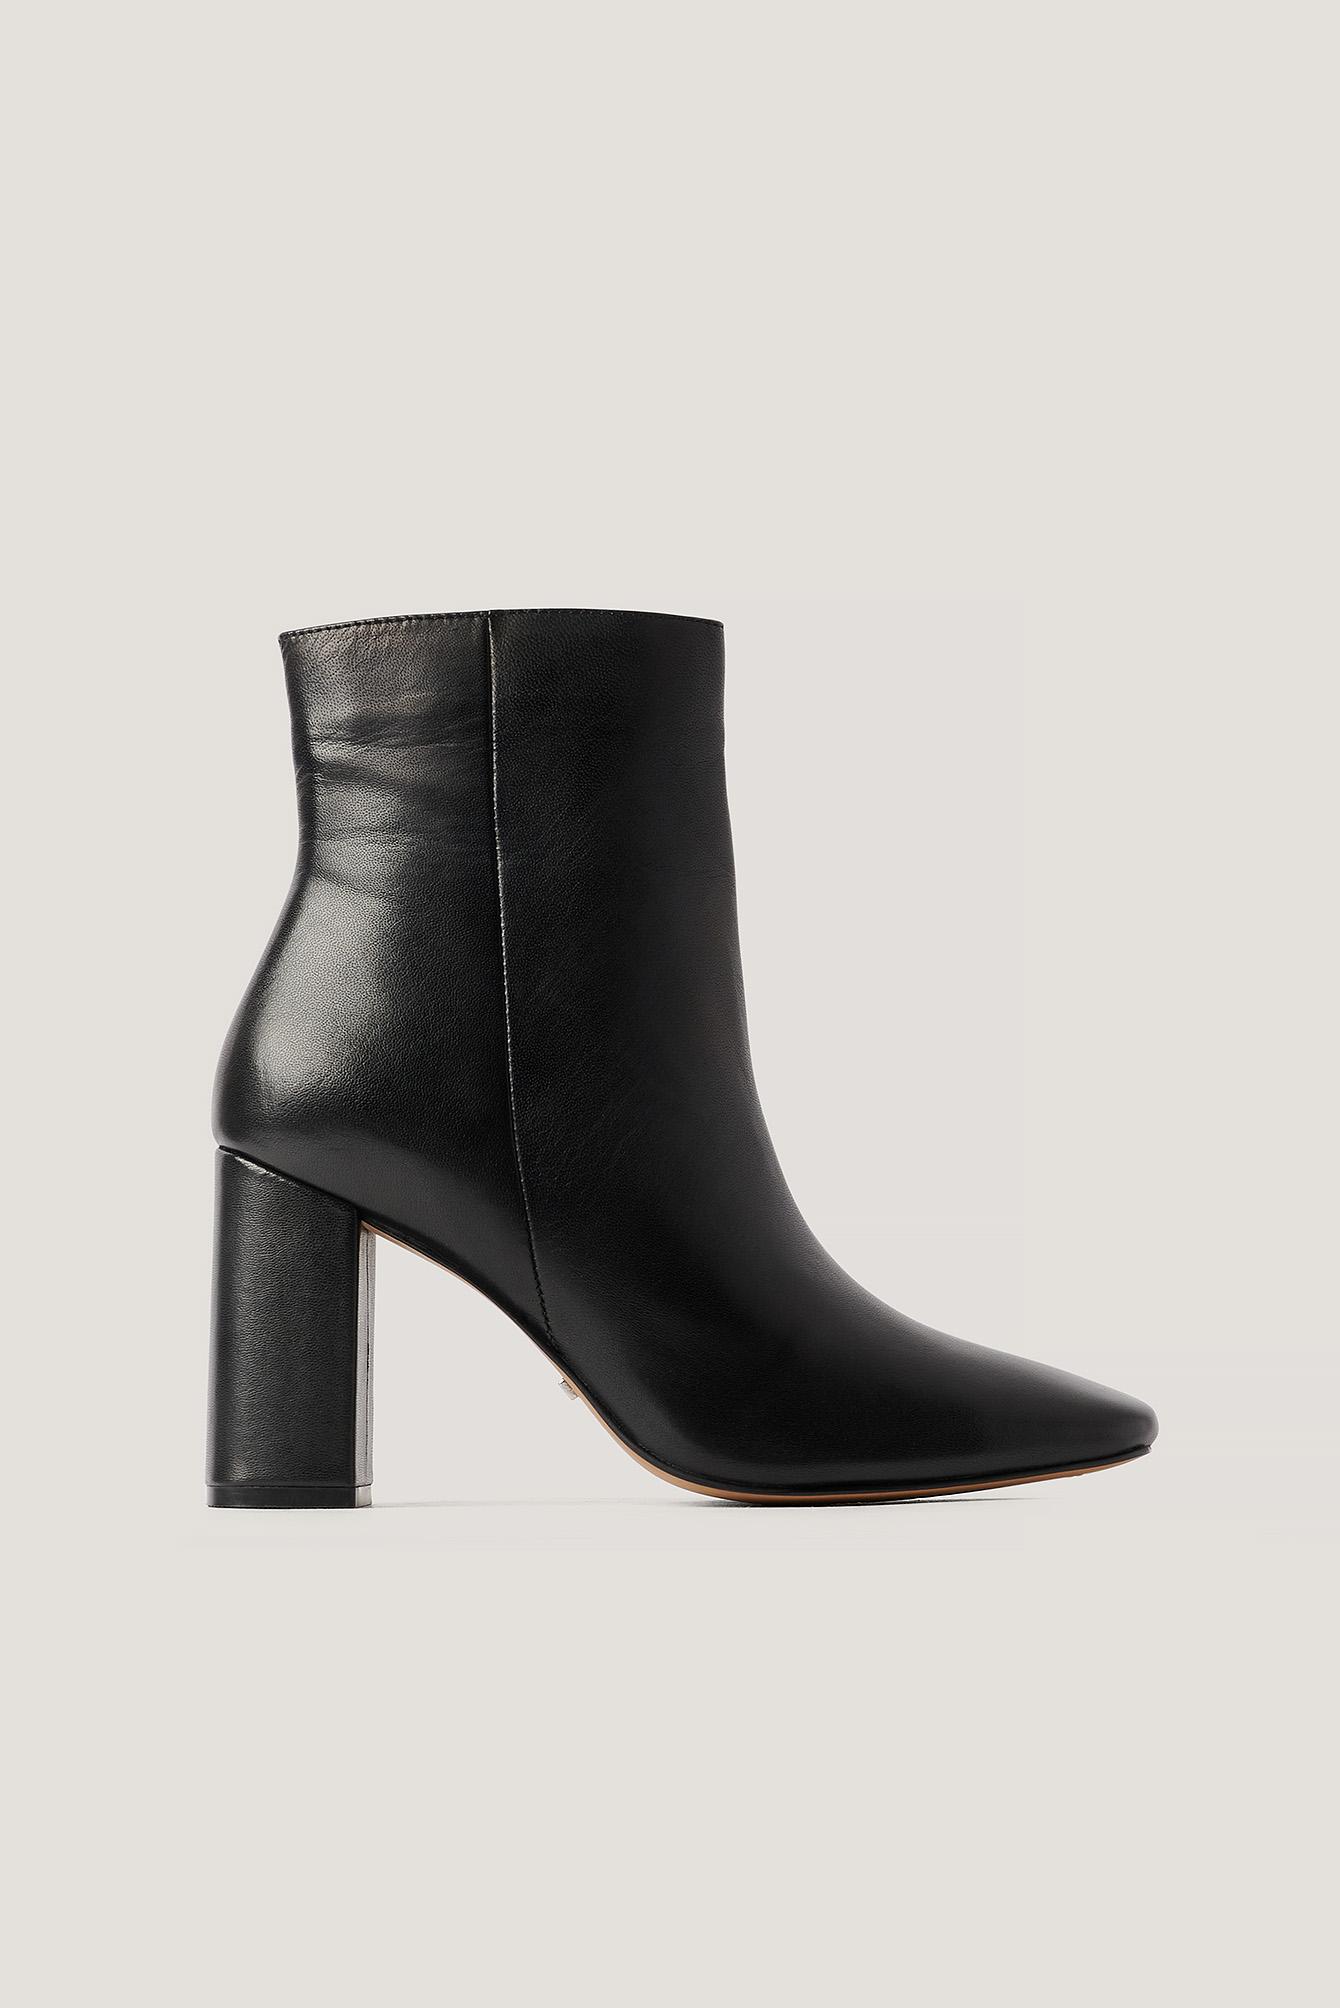 NA-KD Shoes Basic-Nahkasaappaat - Black